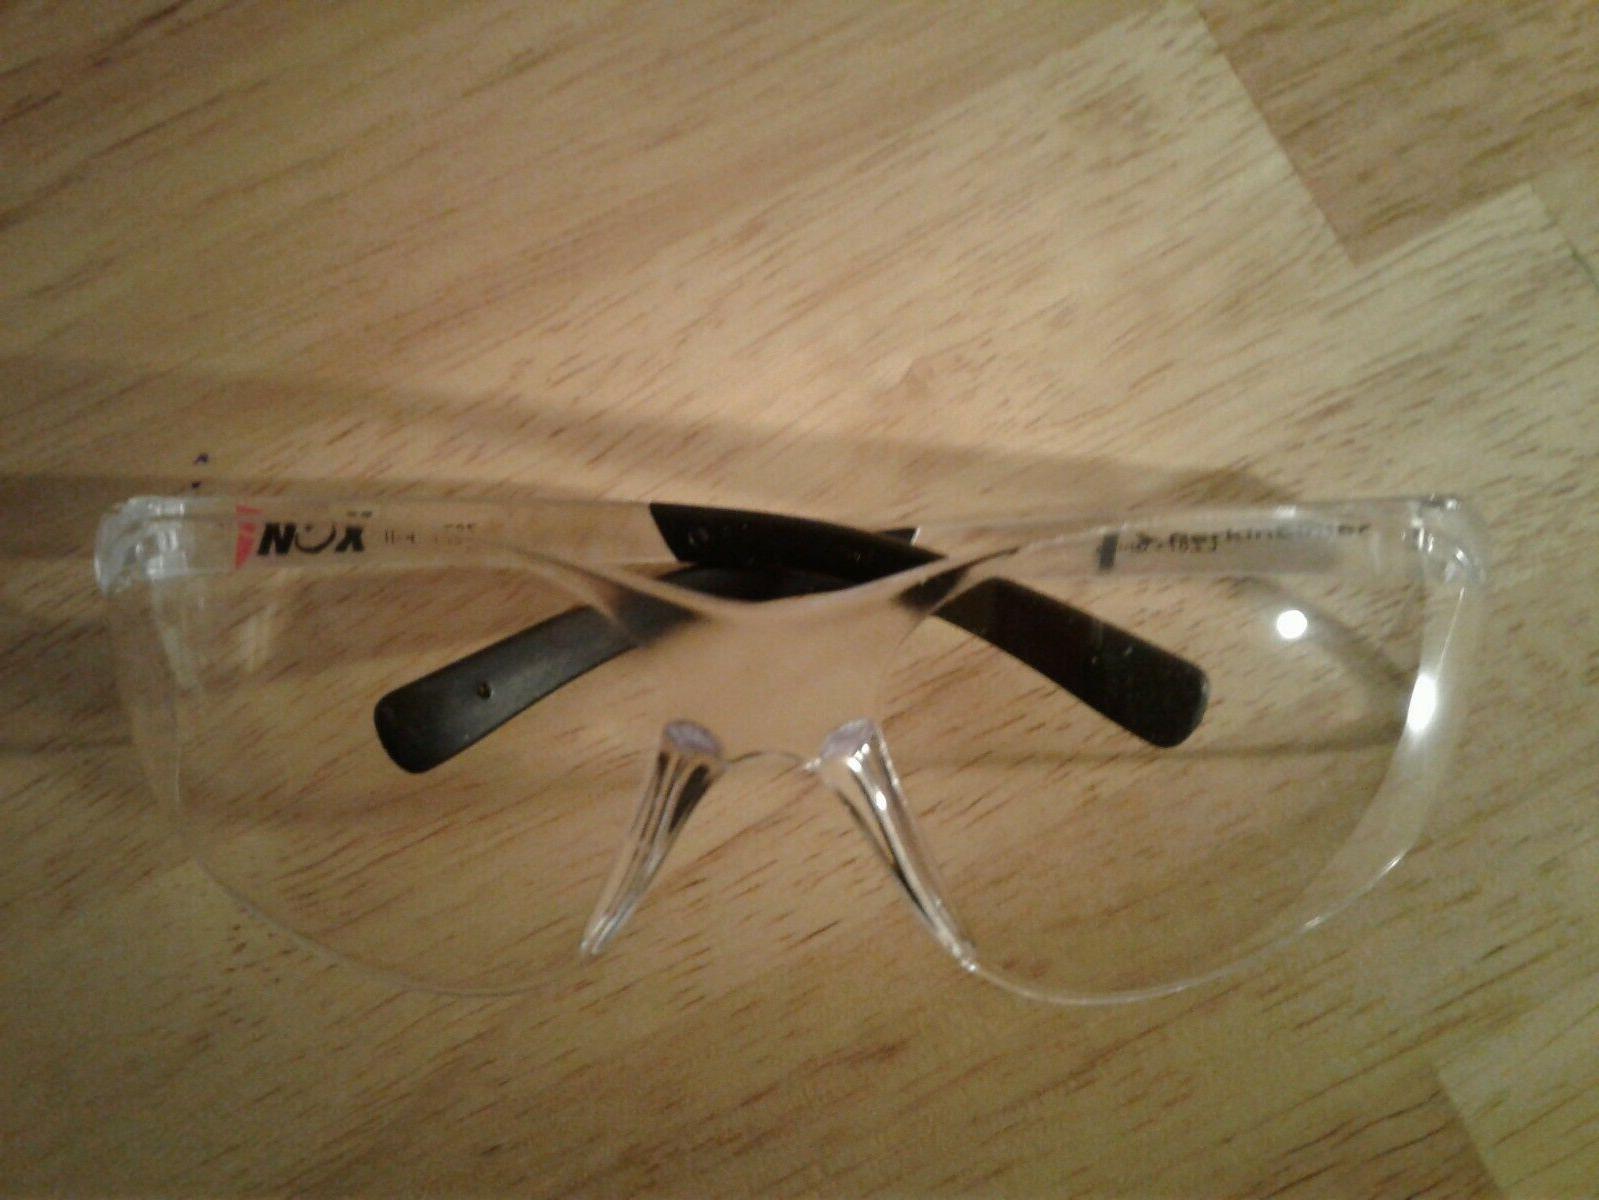 Inox glasses Goggles Clear wipes